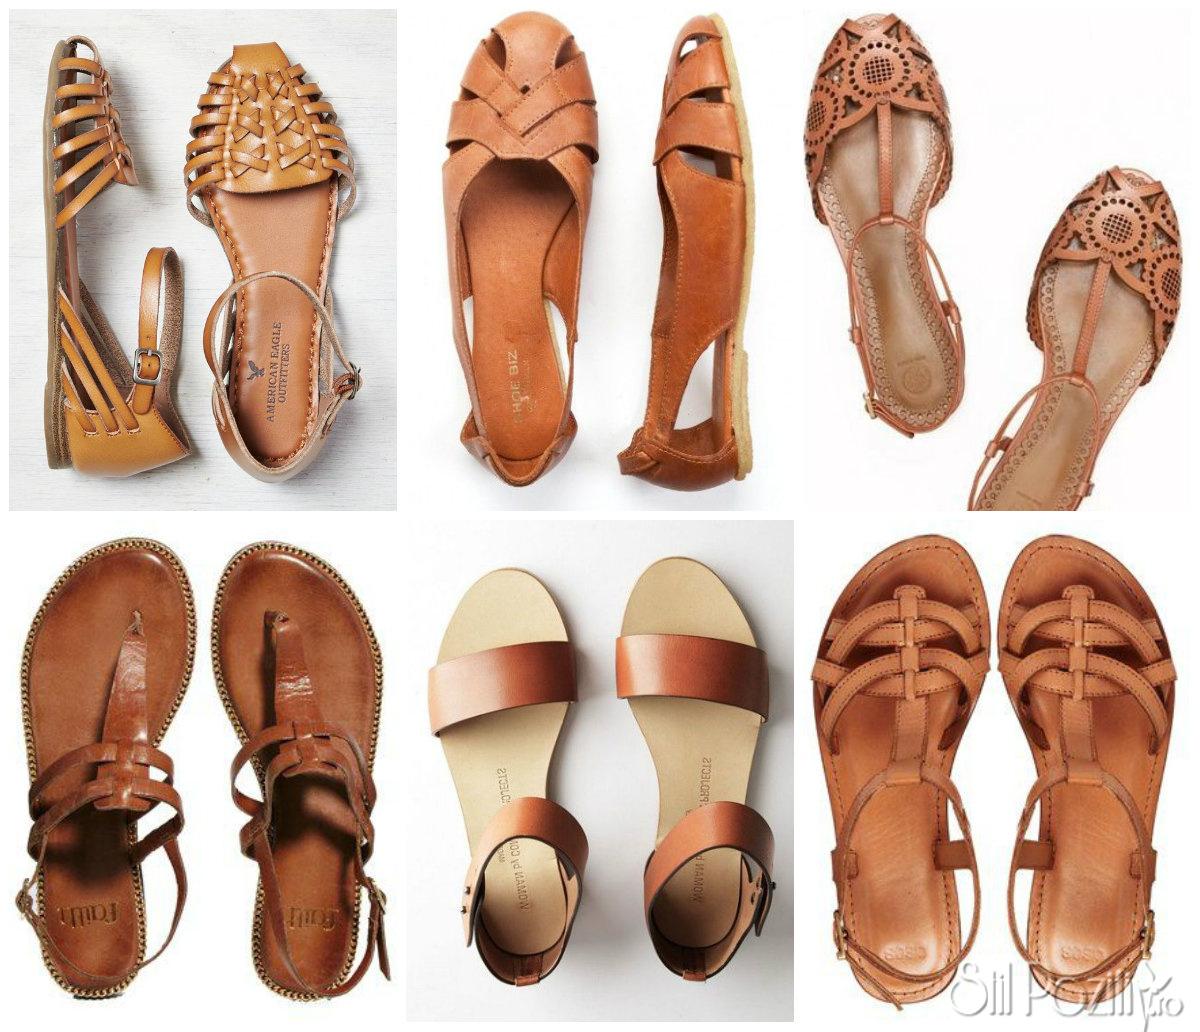 sandale fara toc, sandale talpa joasa